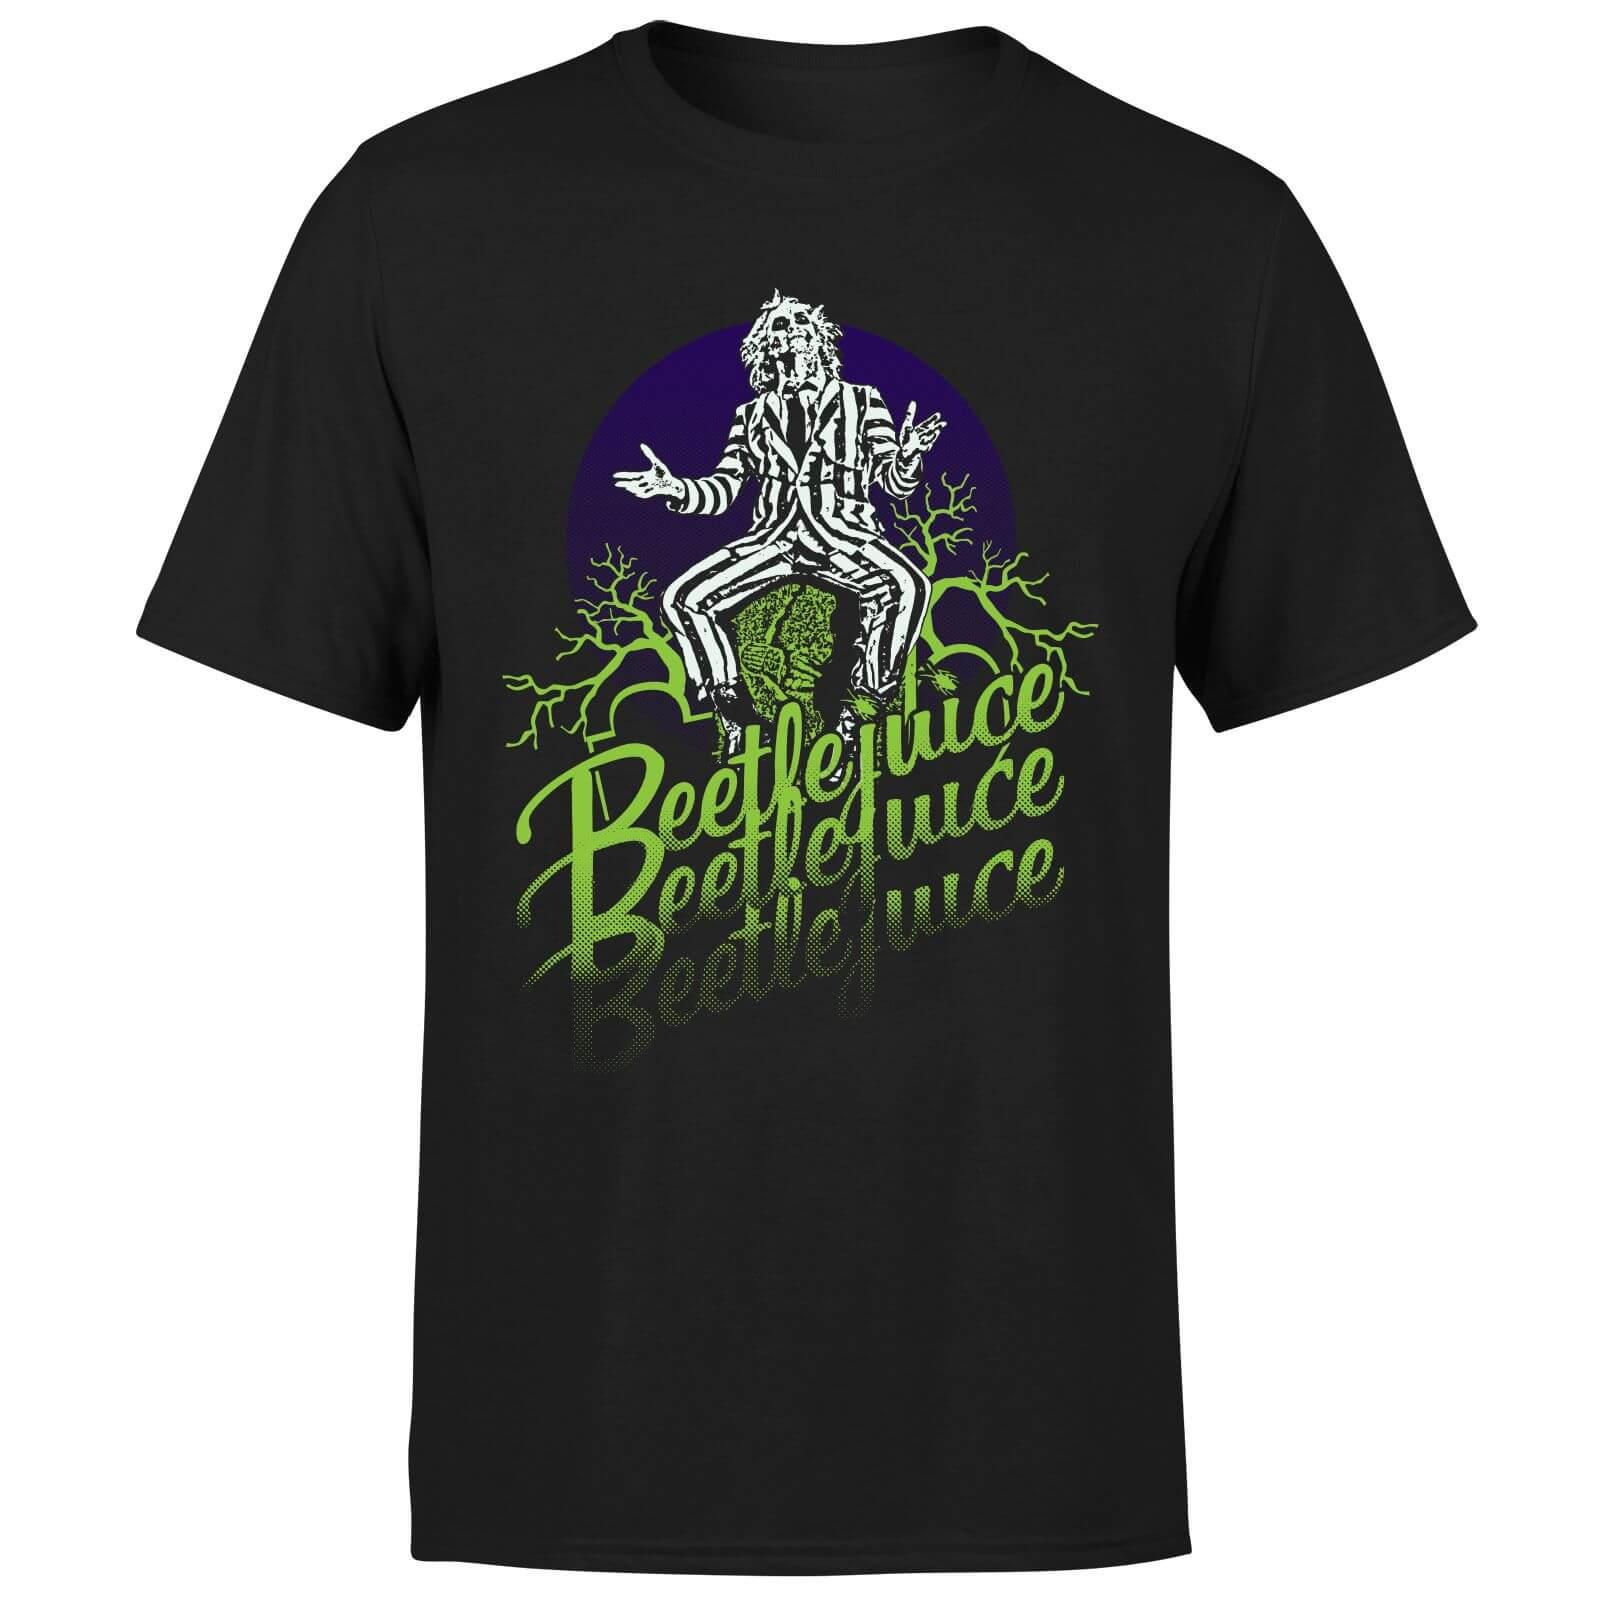 Beetlejuice T-Shirt Homme Beetlejuice Abîmé - Noir - XS - Noir